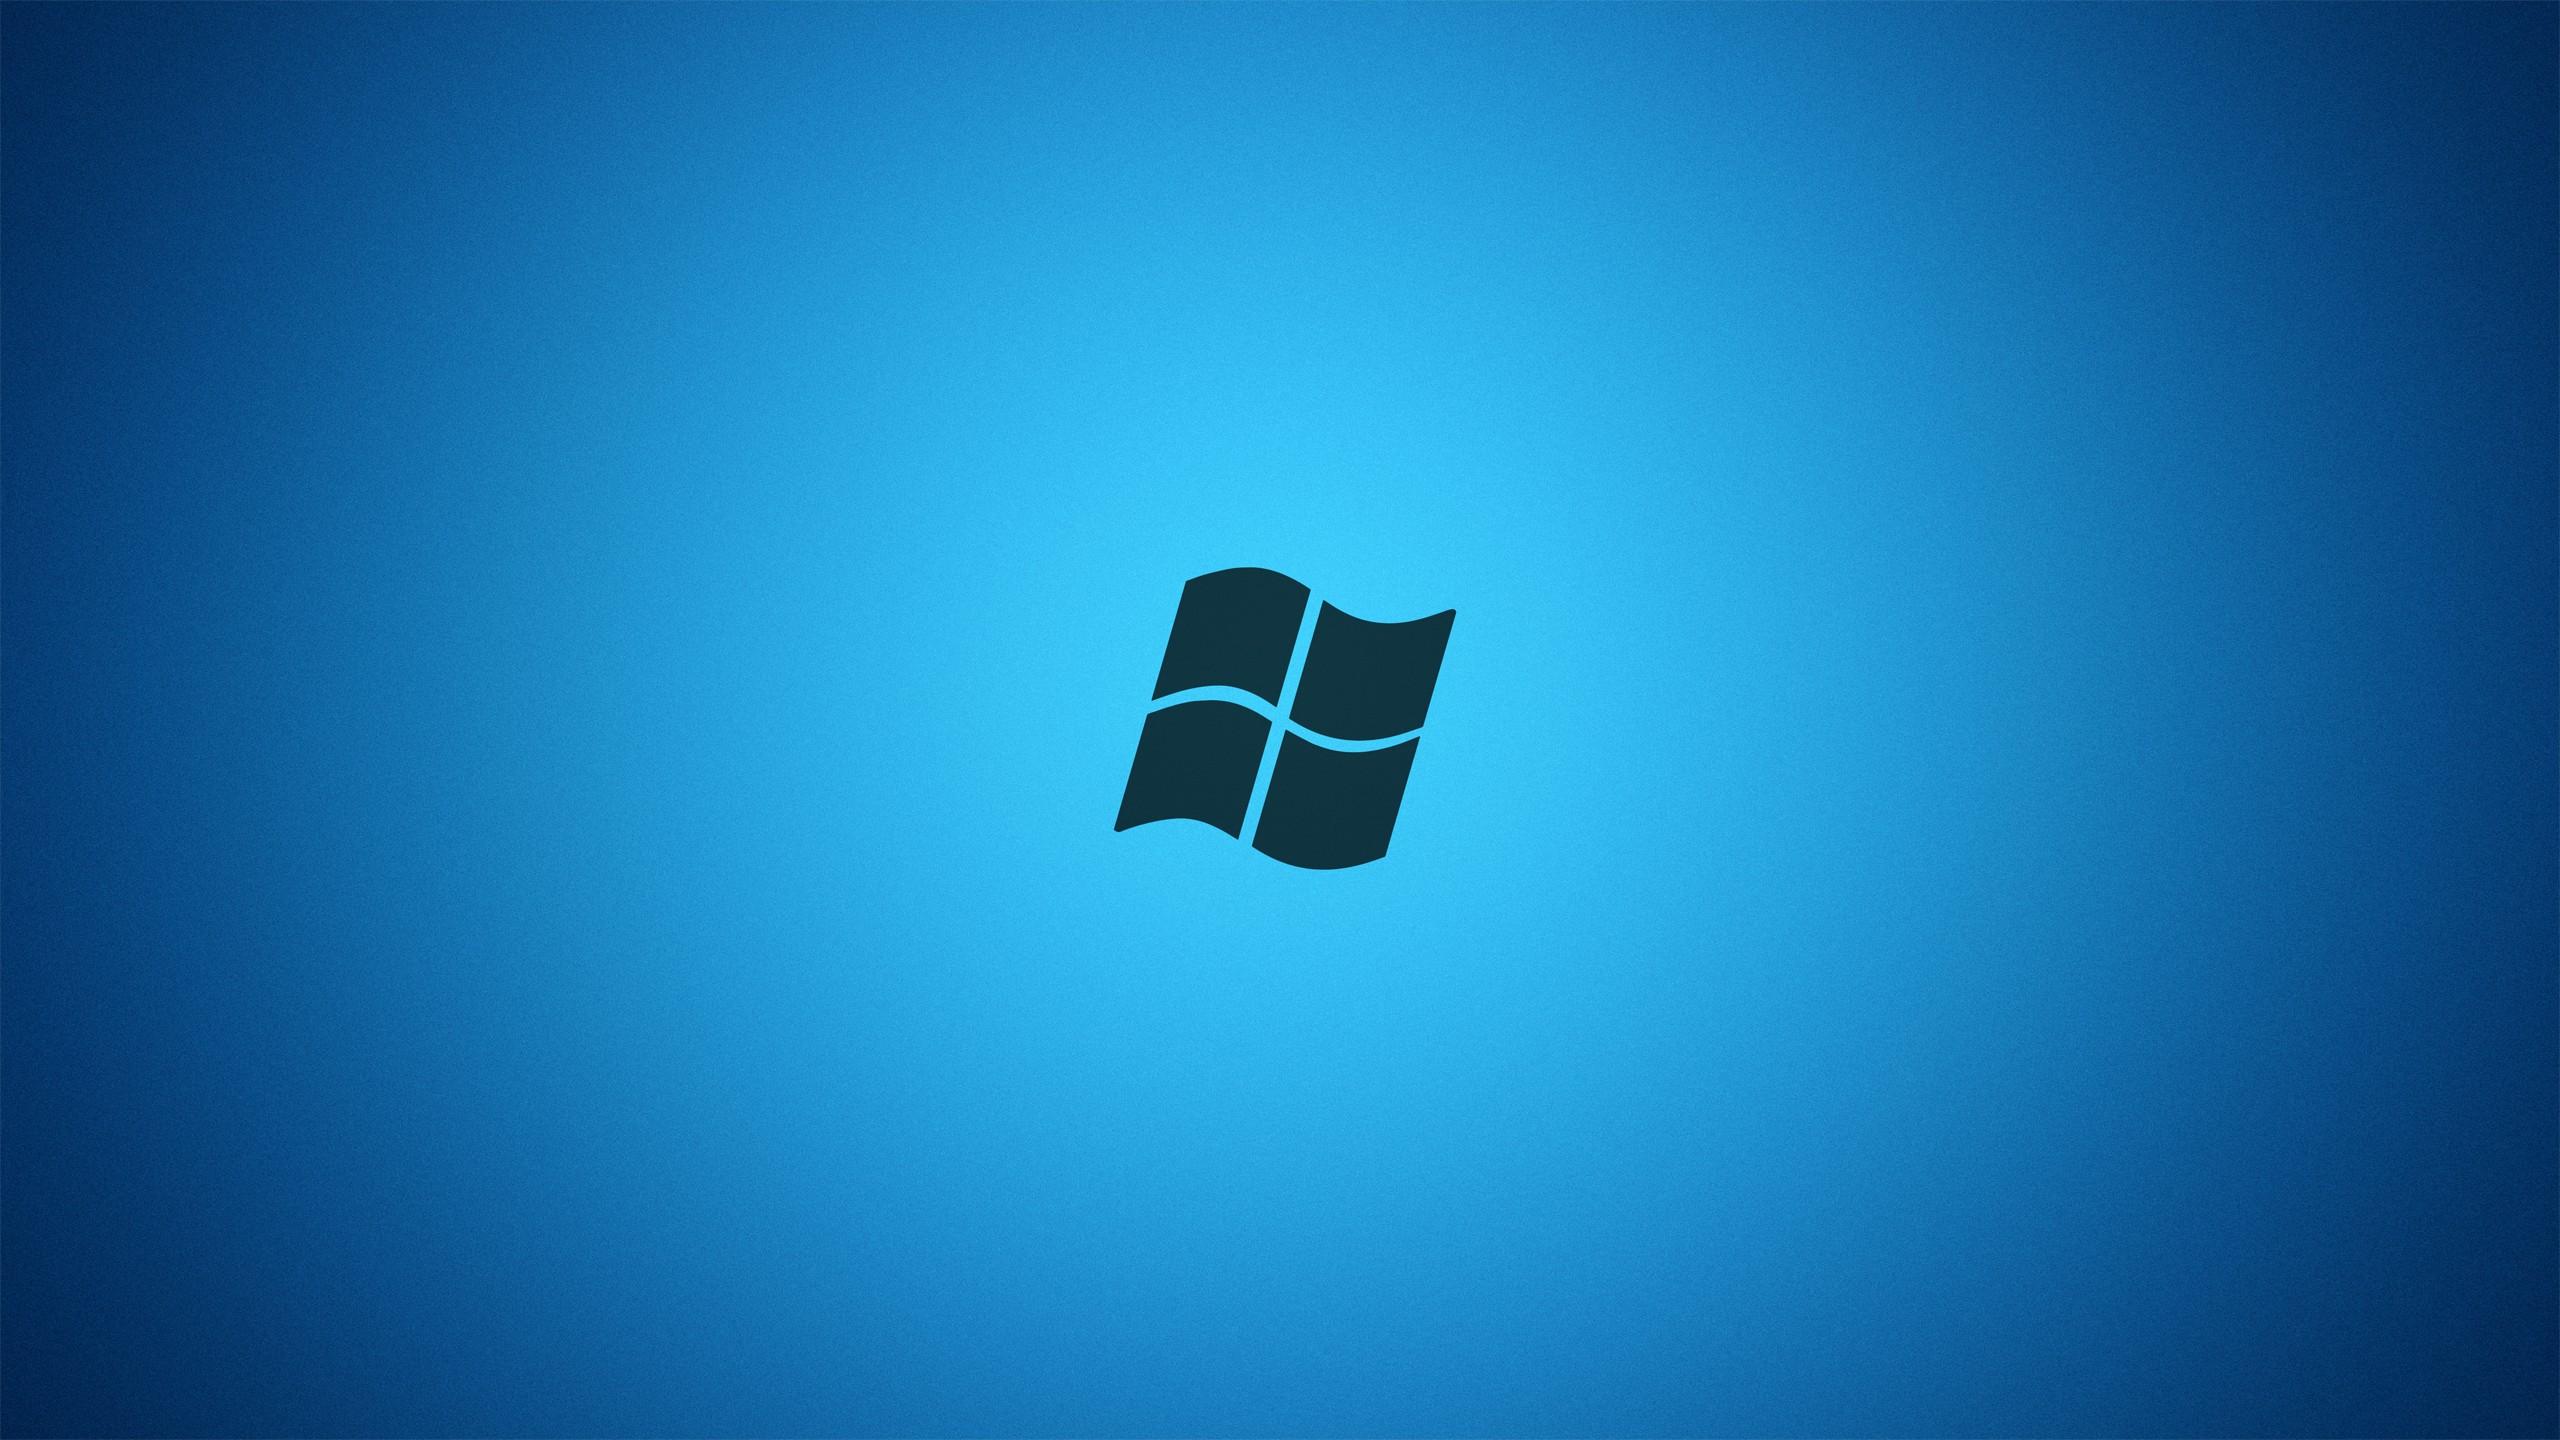 Blue Windows Background   Wallpaper 31081 2560x1440